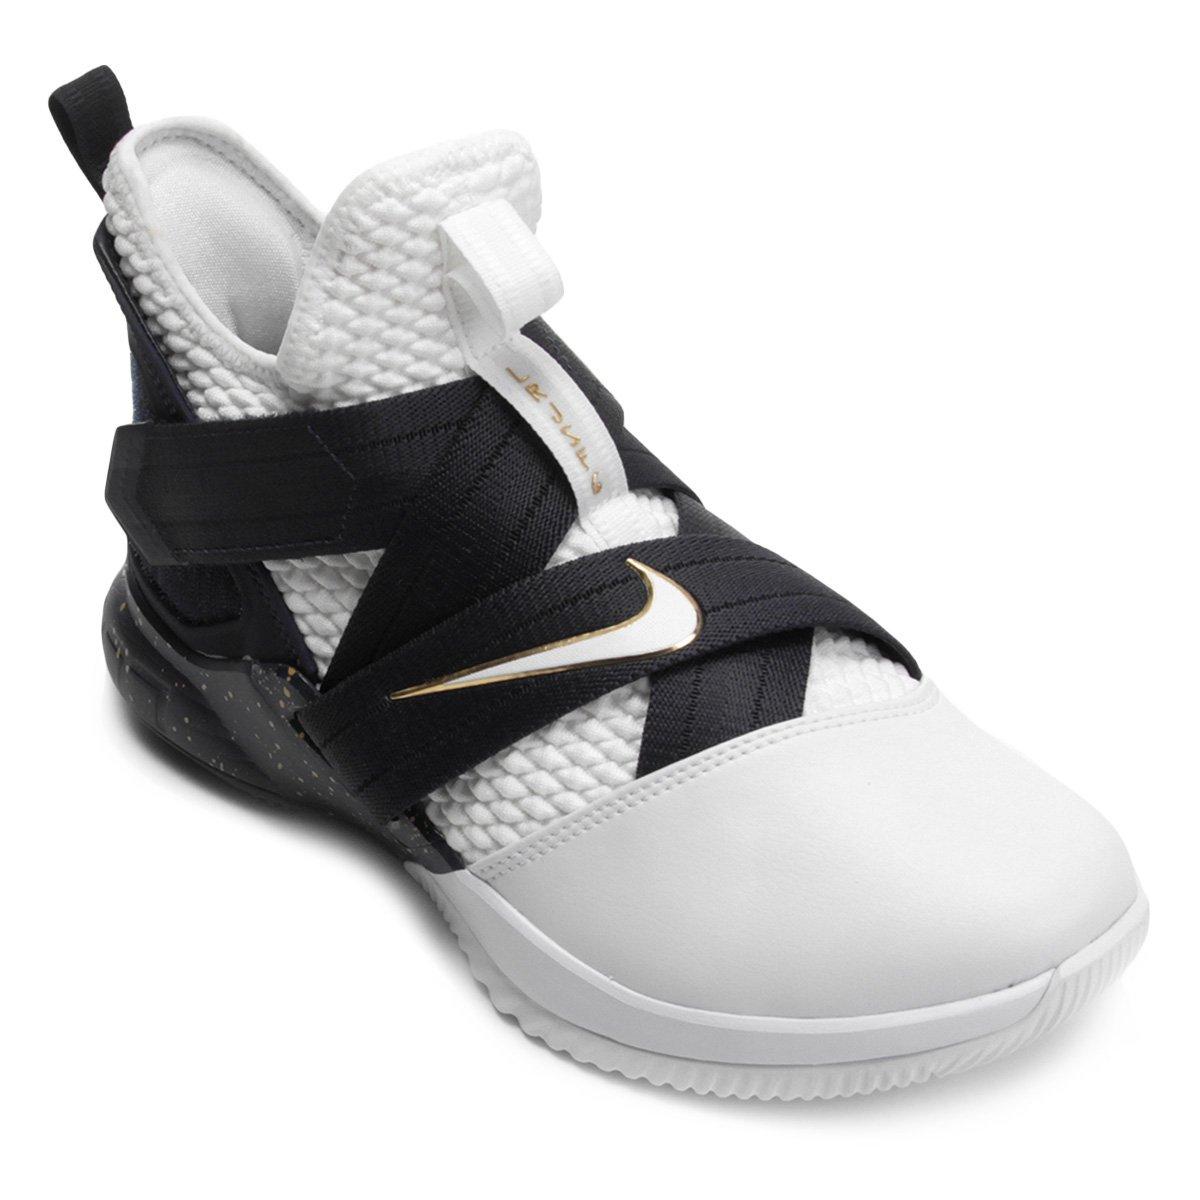 desmayarse Accidental golondrina  Tênis Nike Lebron Soldier XII SFG Masculino | Loja NBA